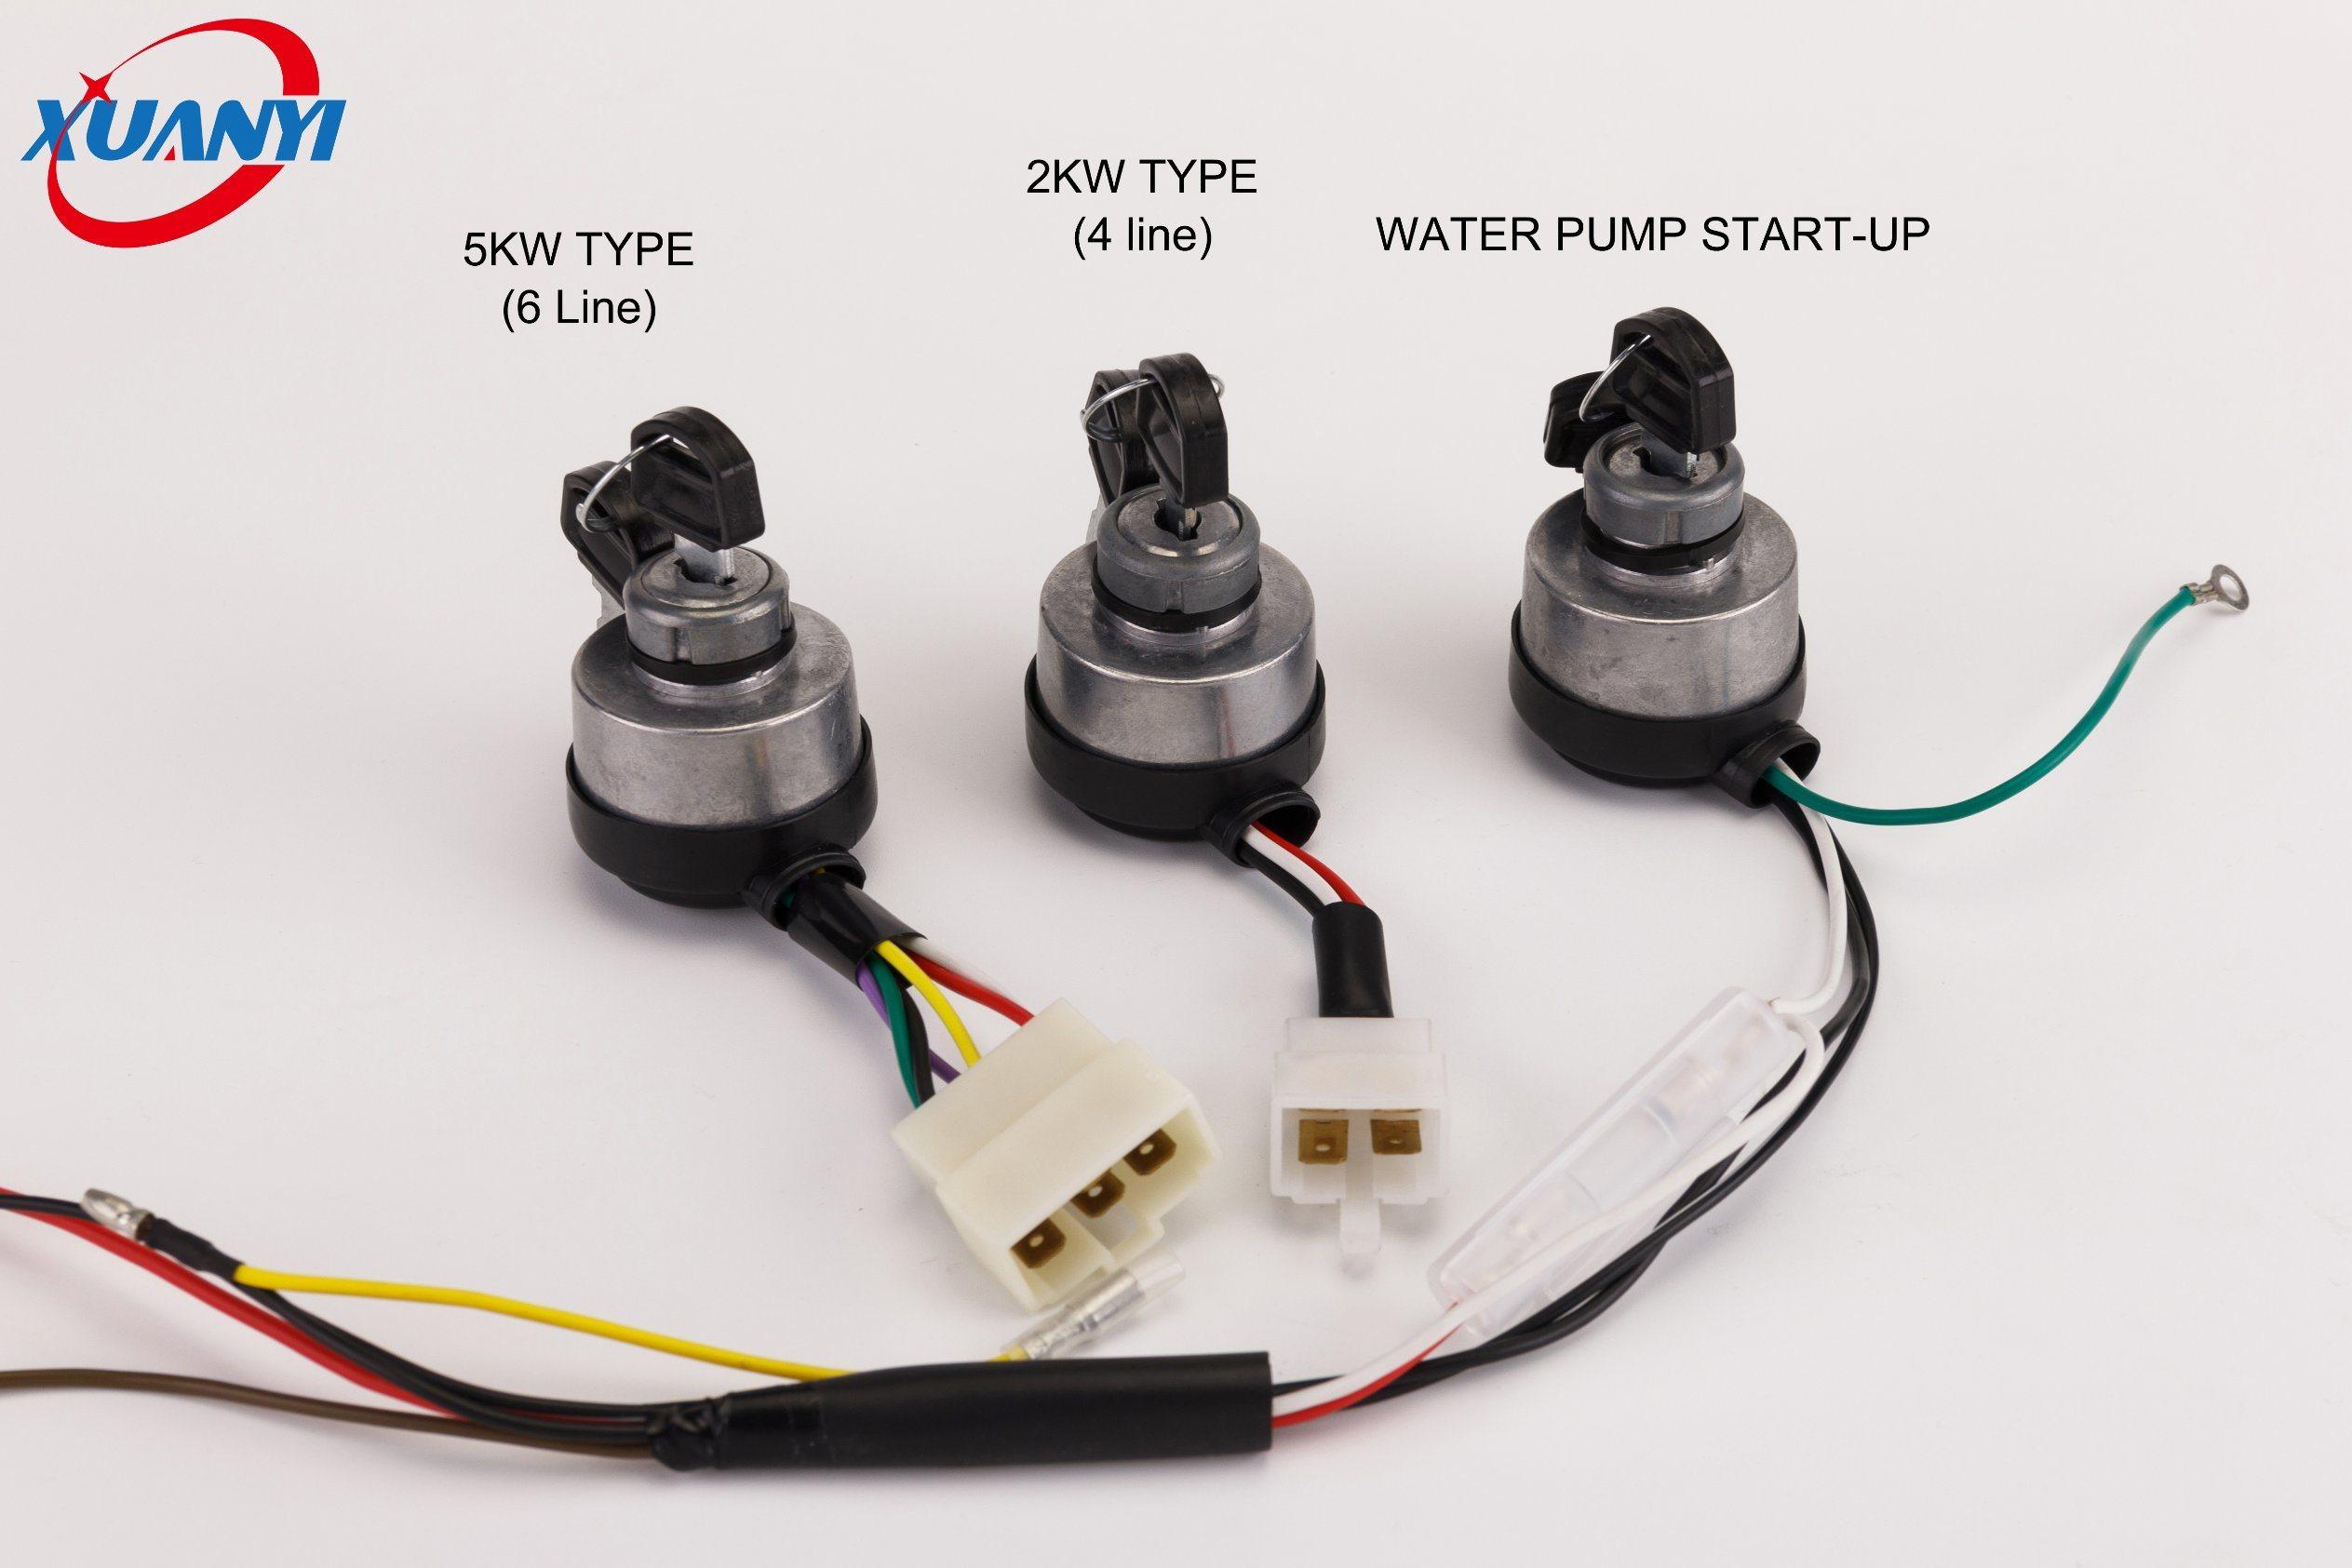 Generator Parts Electric Key Lock for Panel Key Start Key&Lock